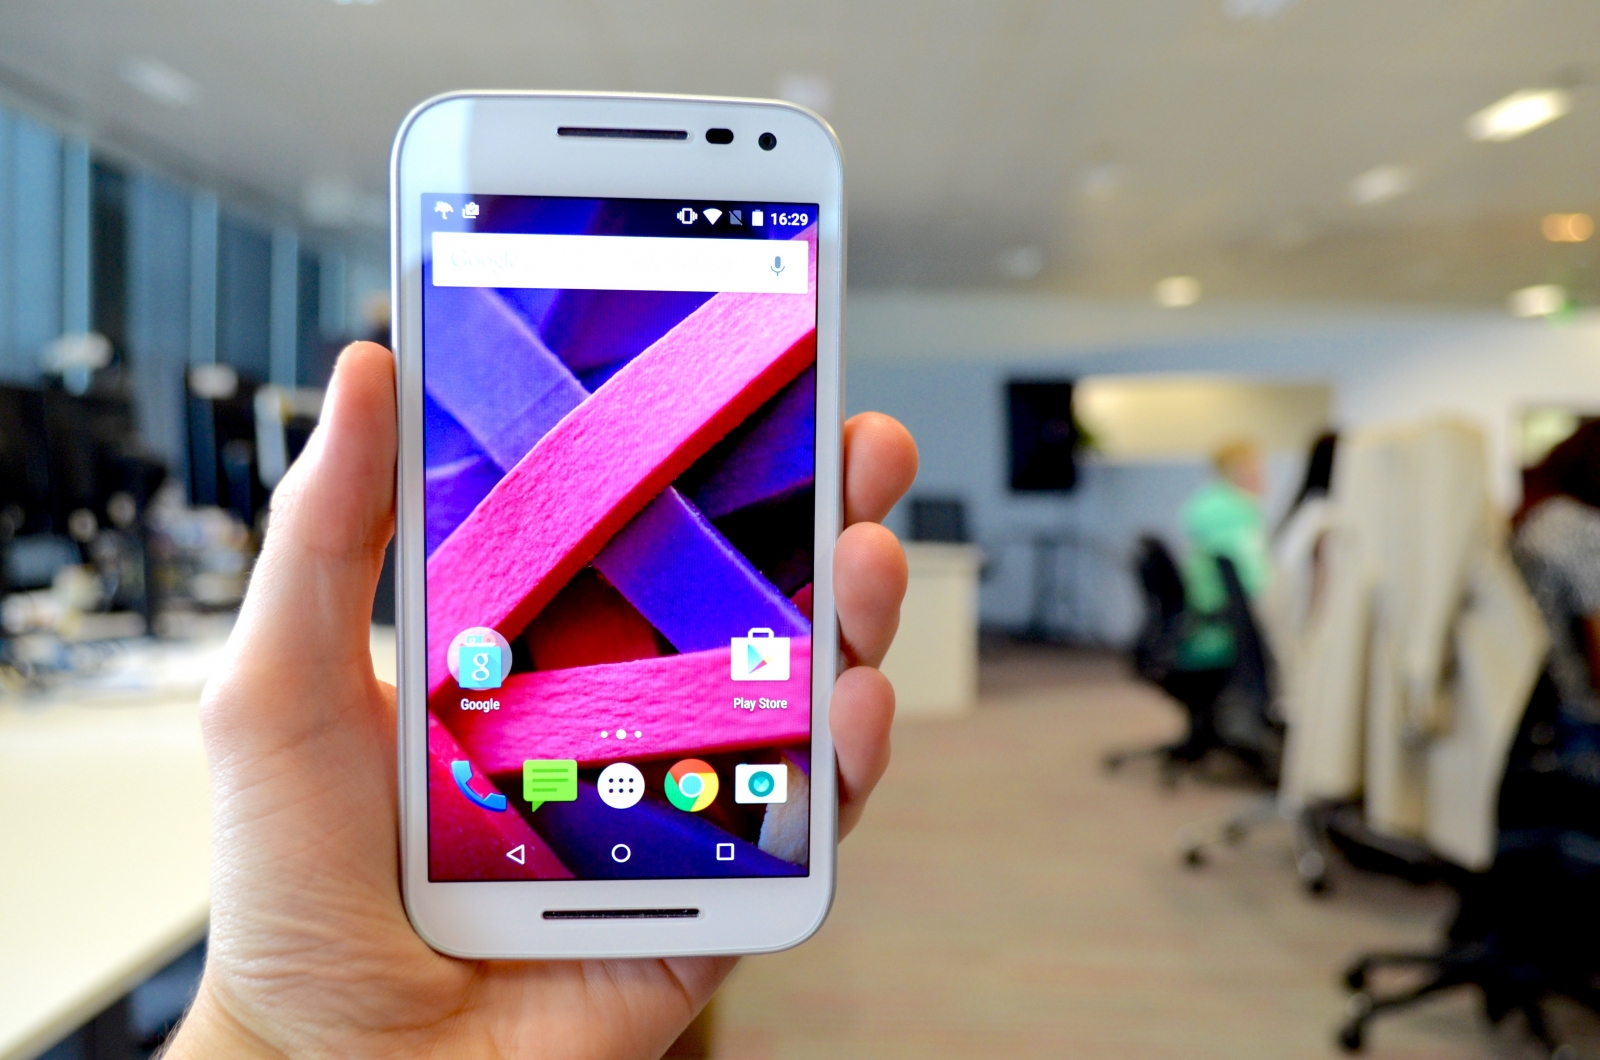 Motorola Moto G 3rd generation 2015